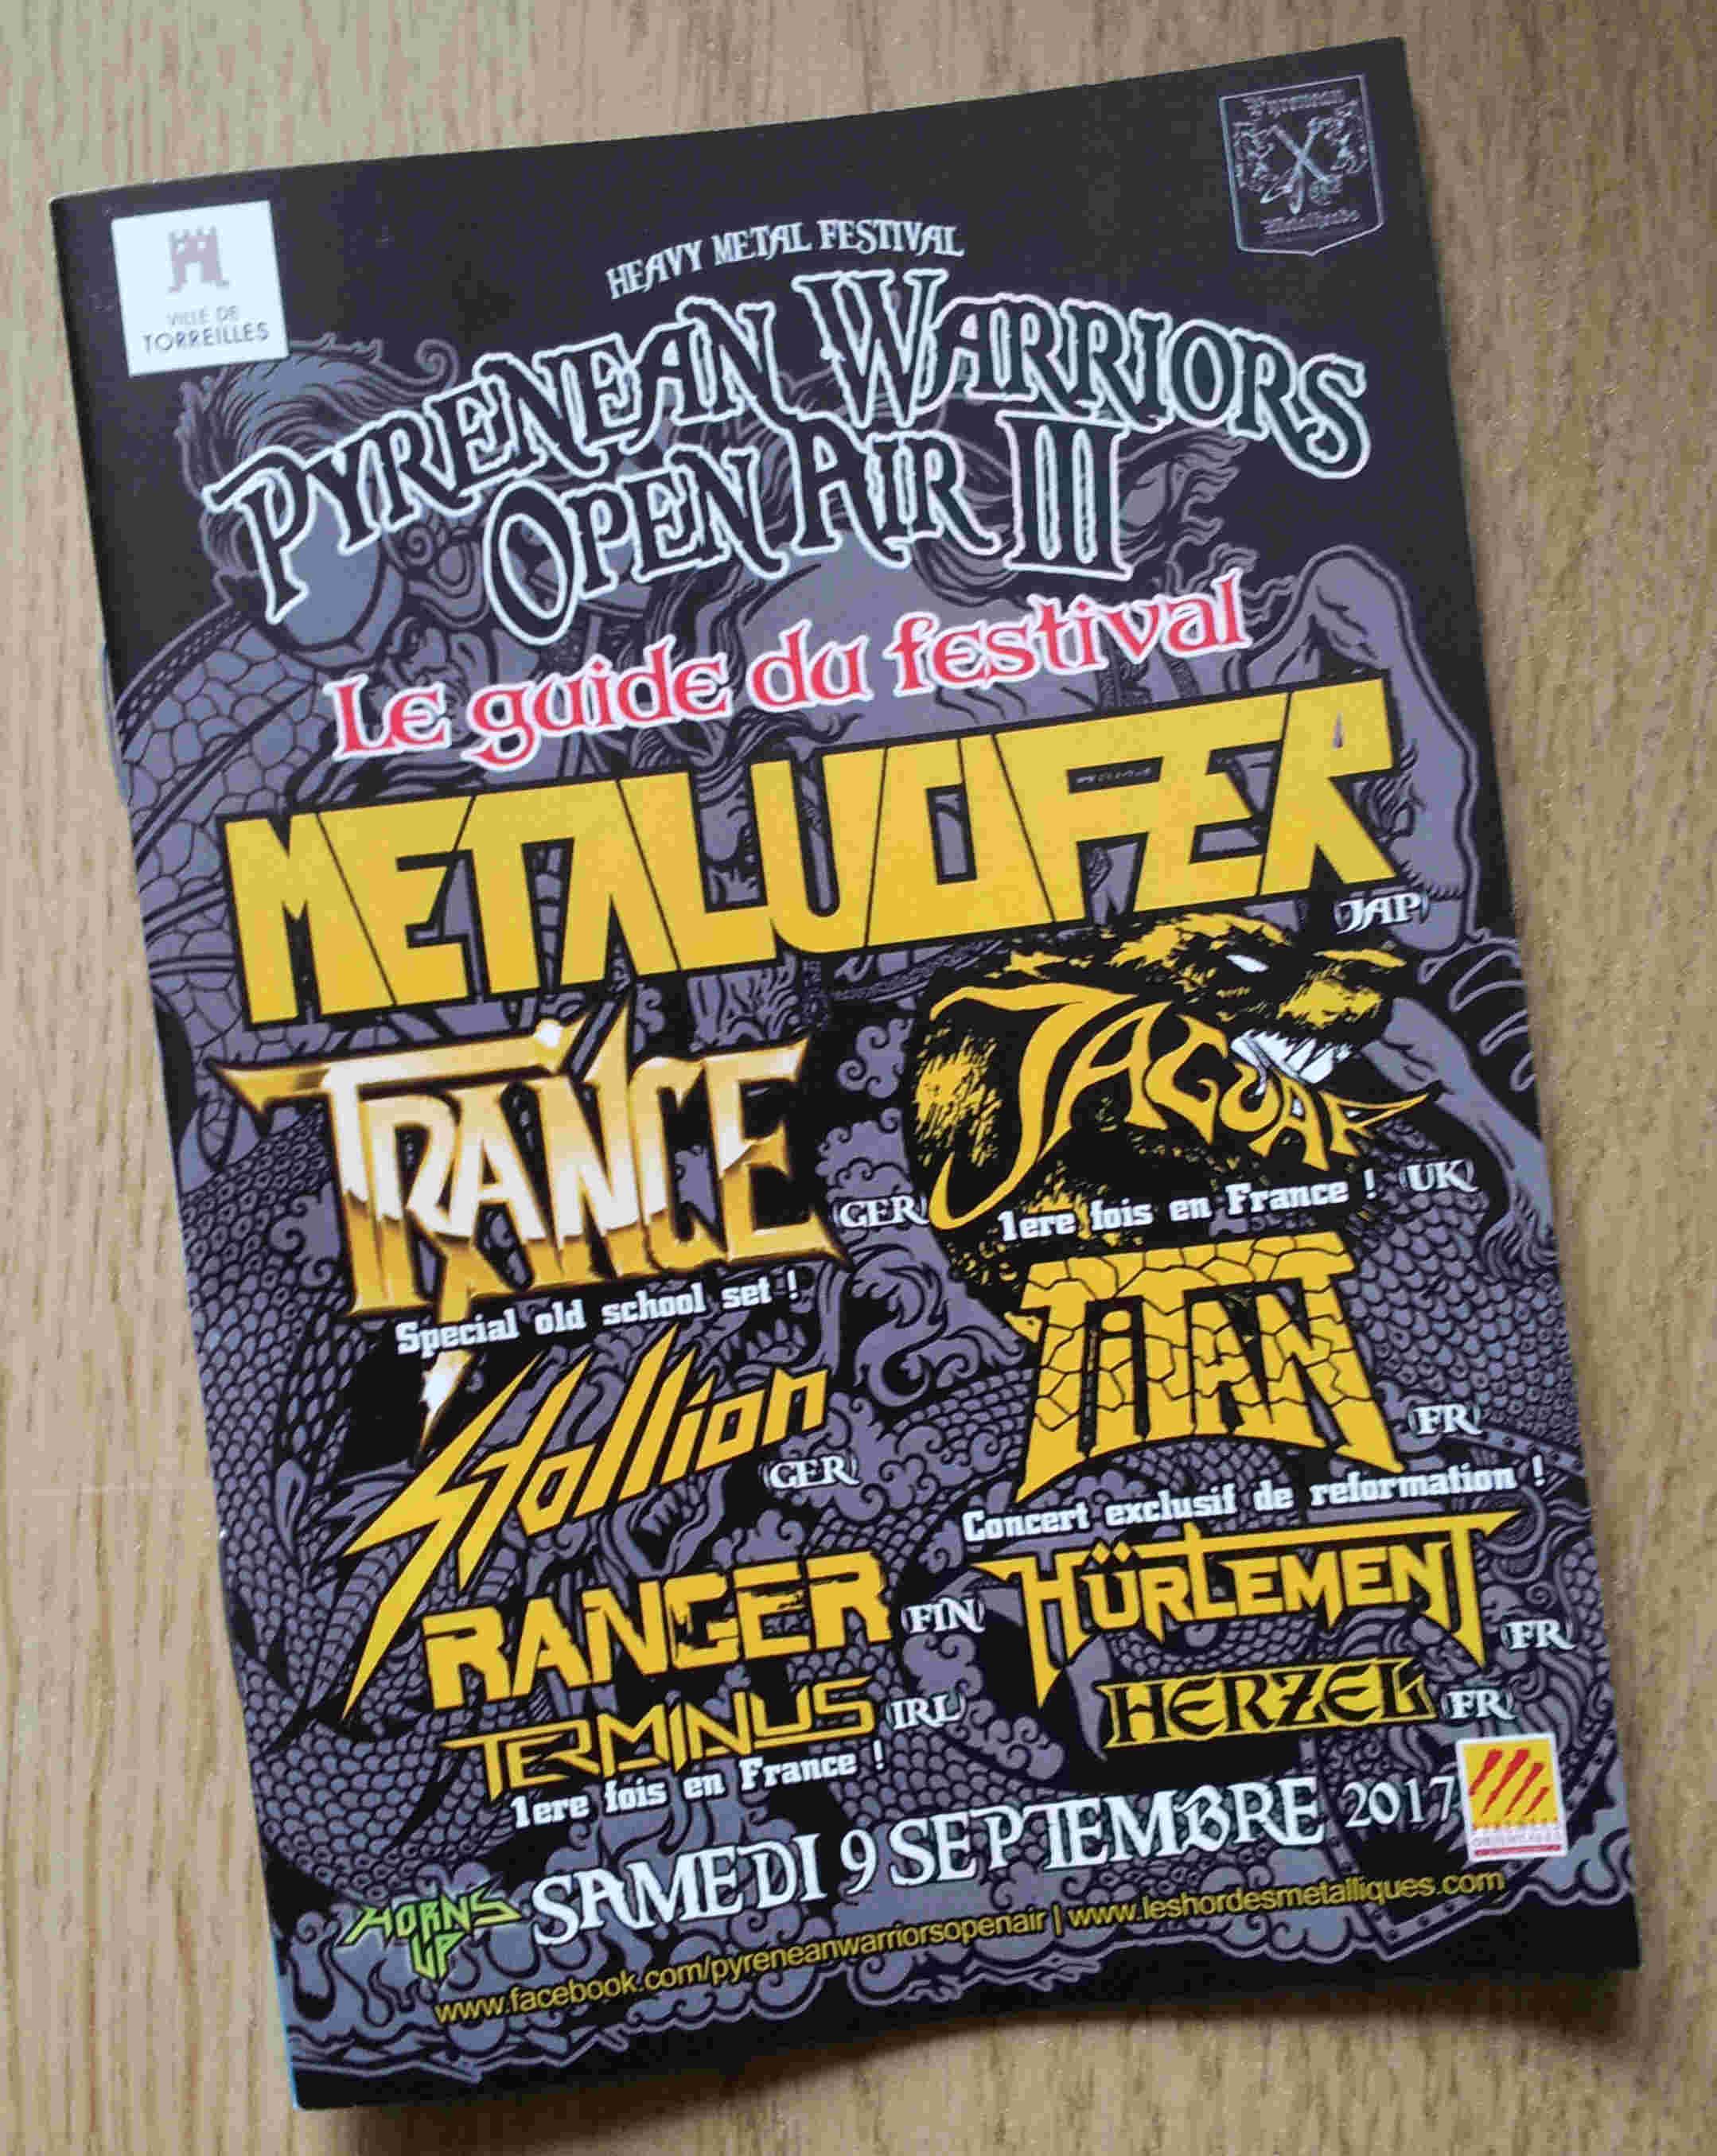 HERZEL Unis dans la gloire (2015) Heavy Metal Quimper 20171018